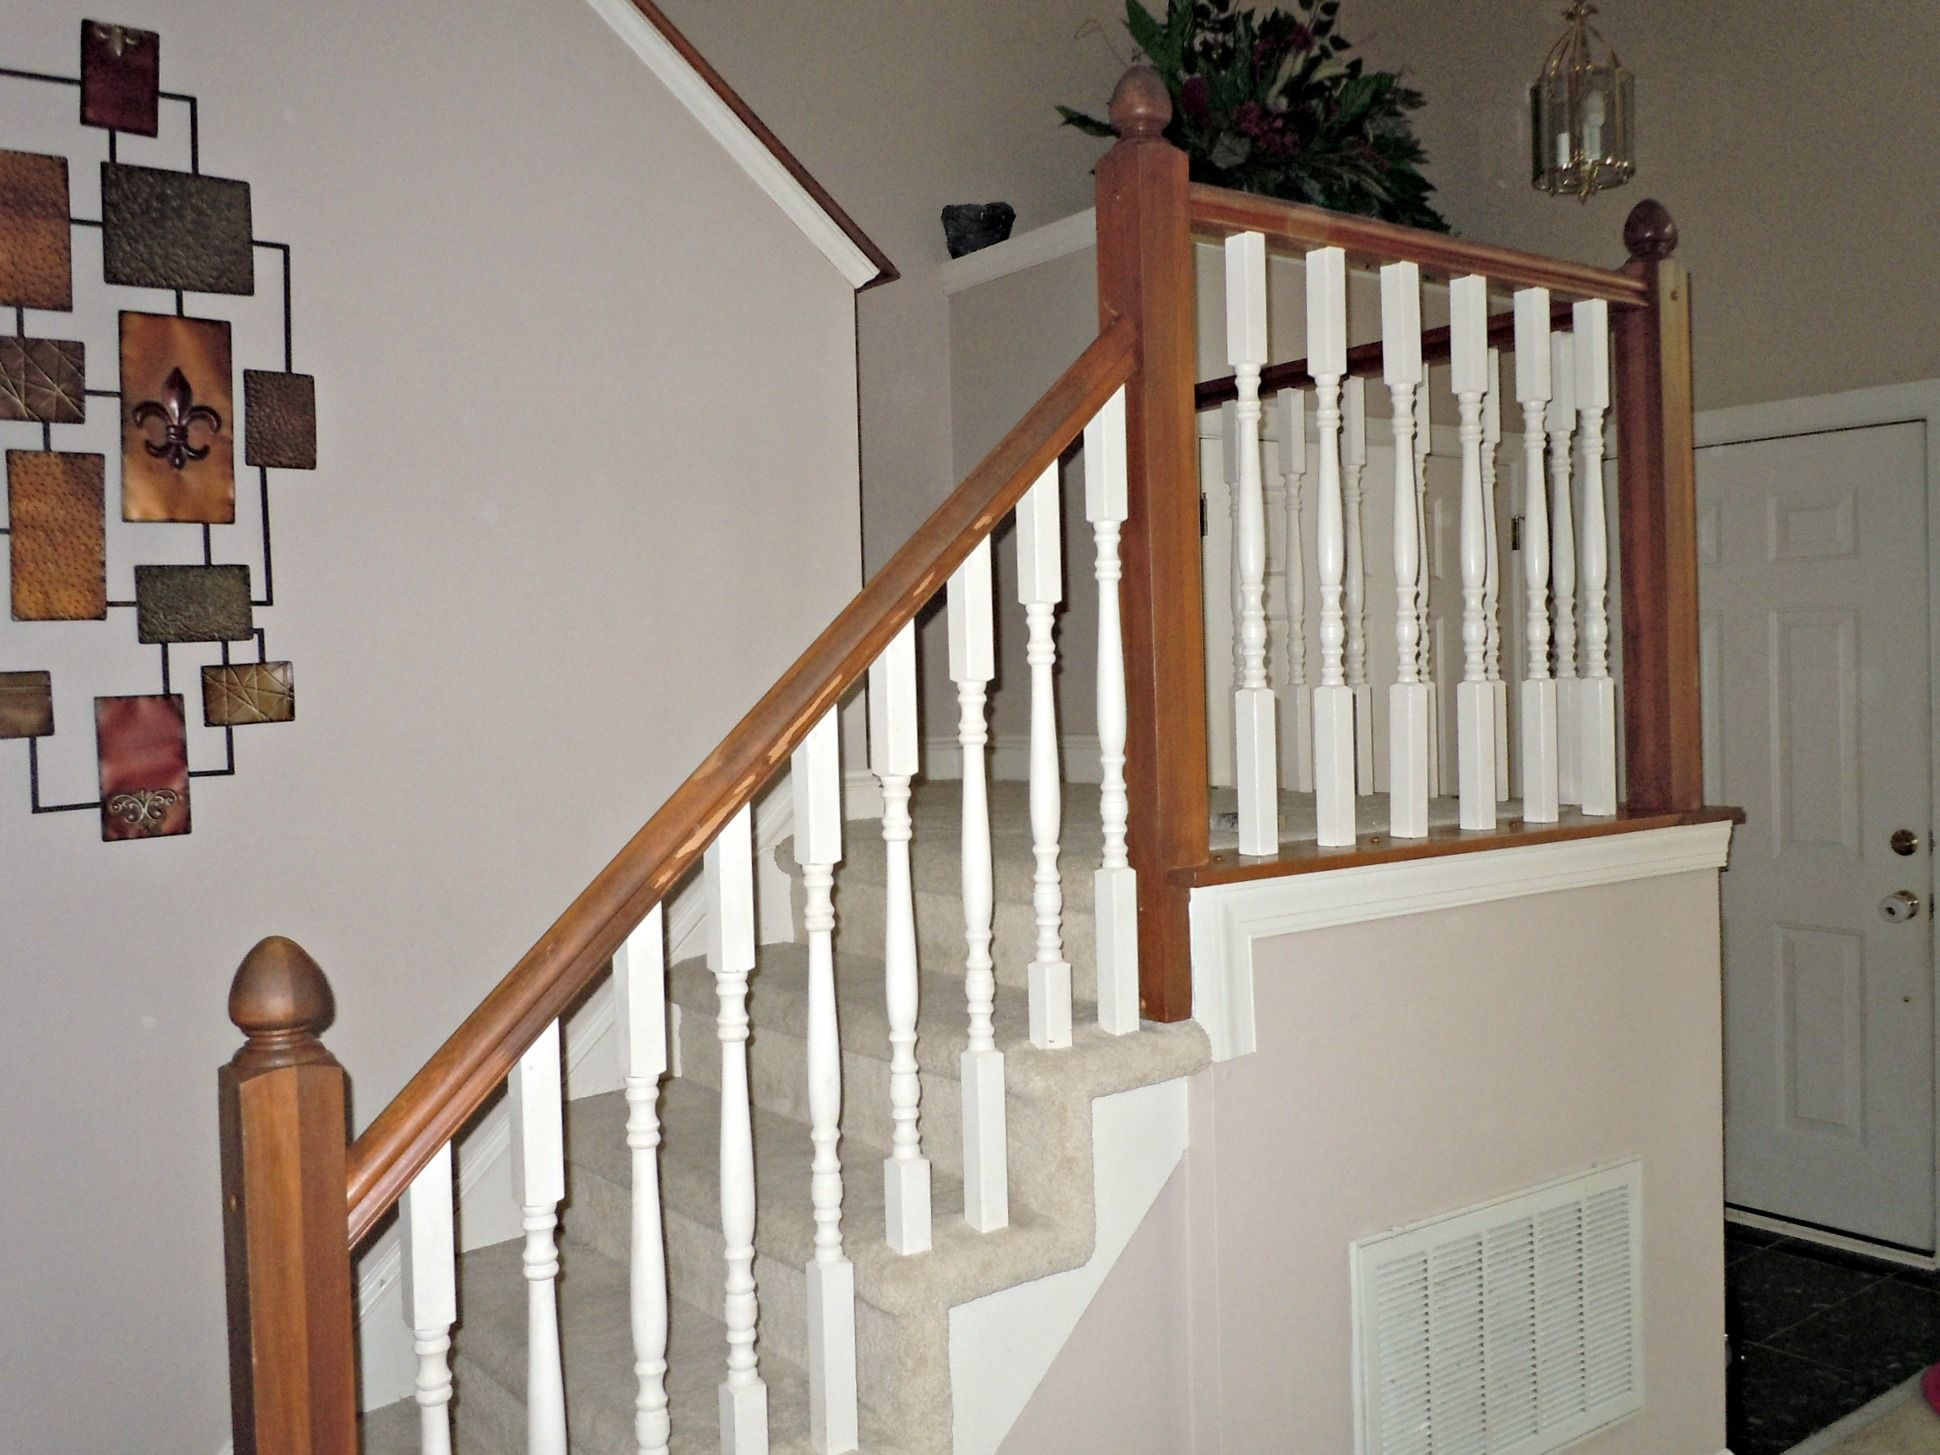 Diy Stair Banister Makeover Using Gel Stain Stair Banister Diy